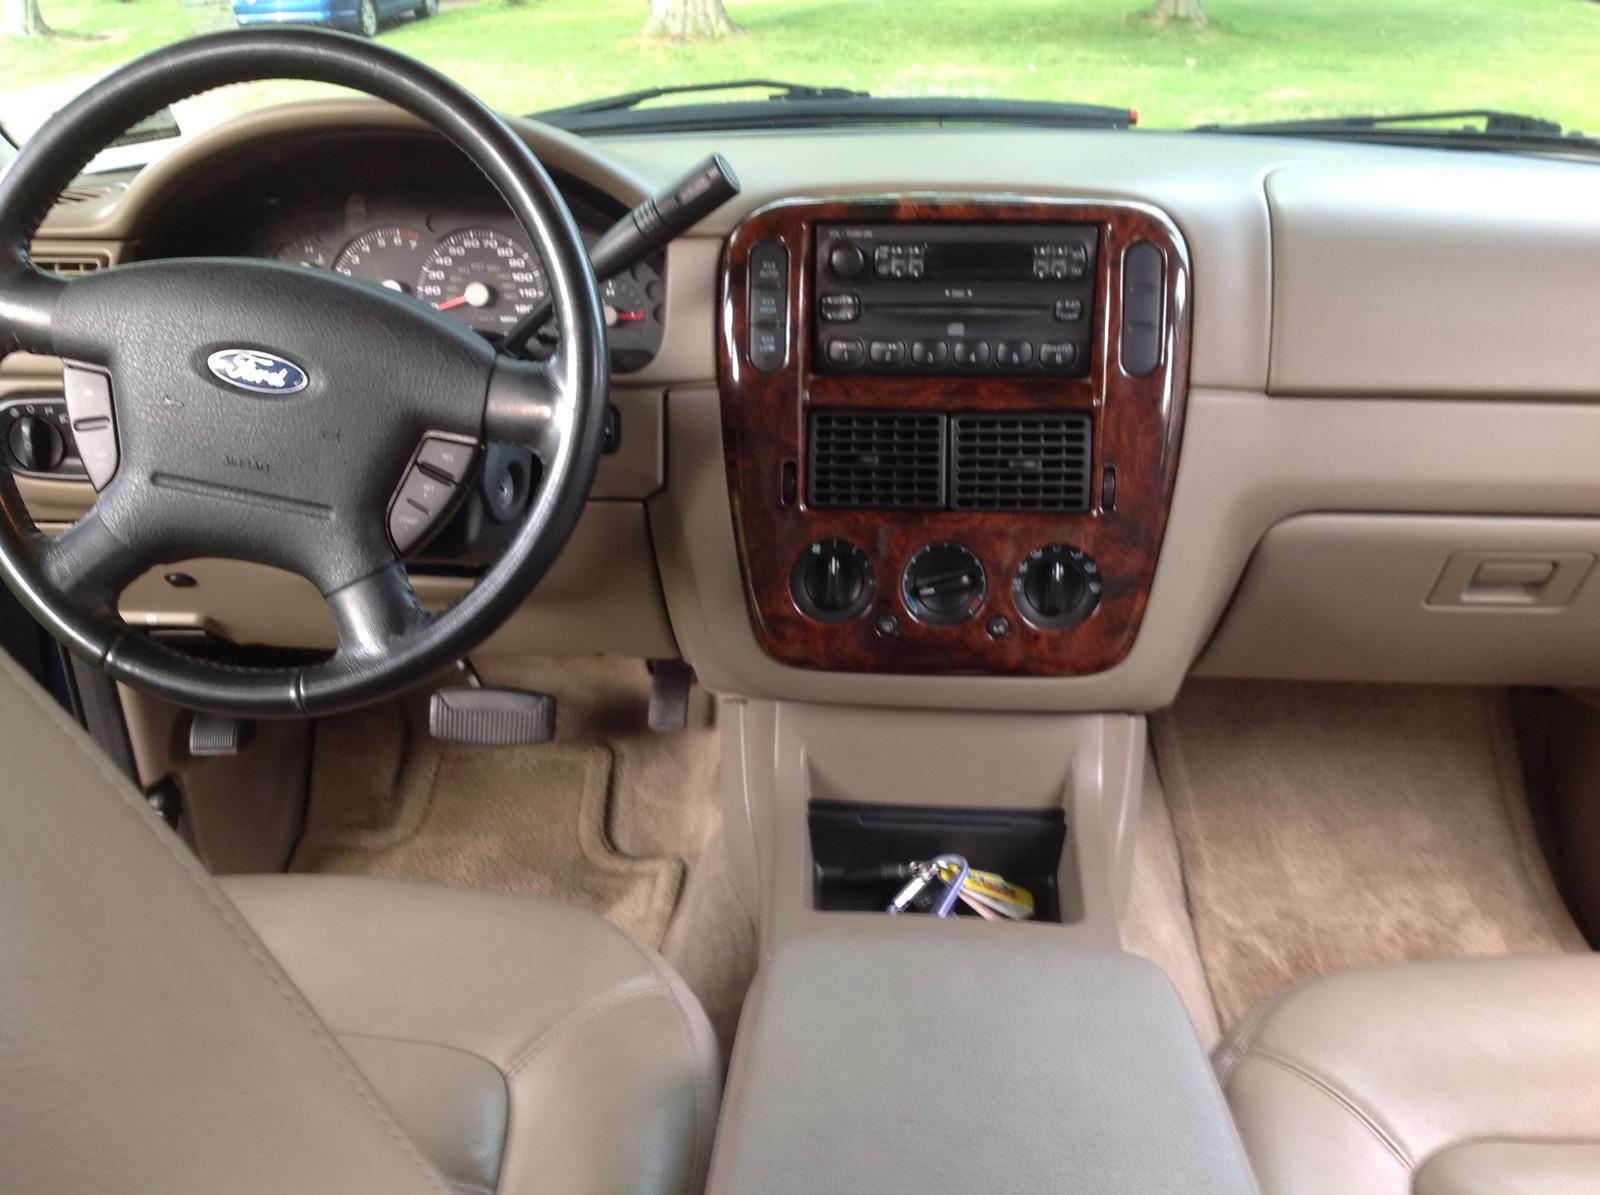 Picture Of 2004 Ford Explorer Xlt V6 Awd Interior